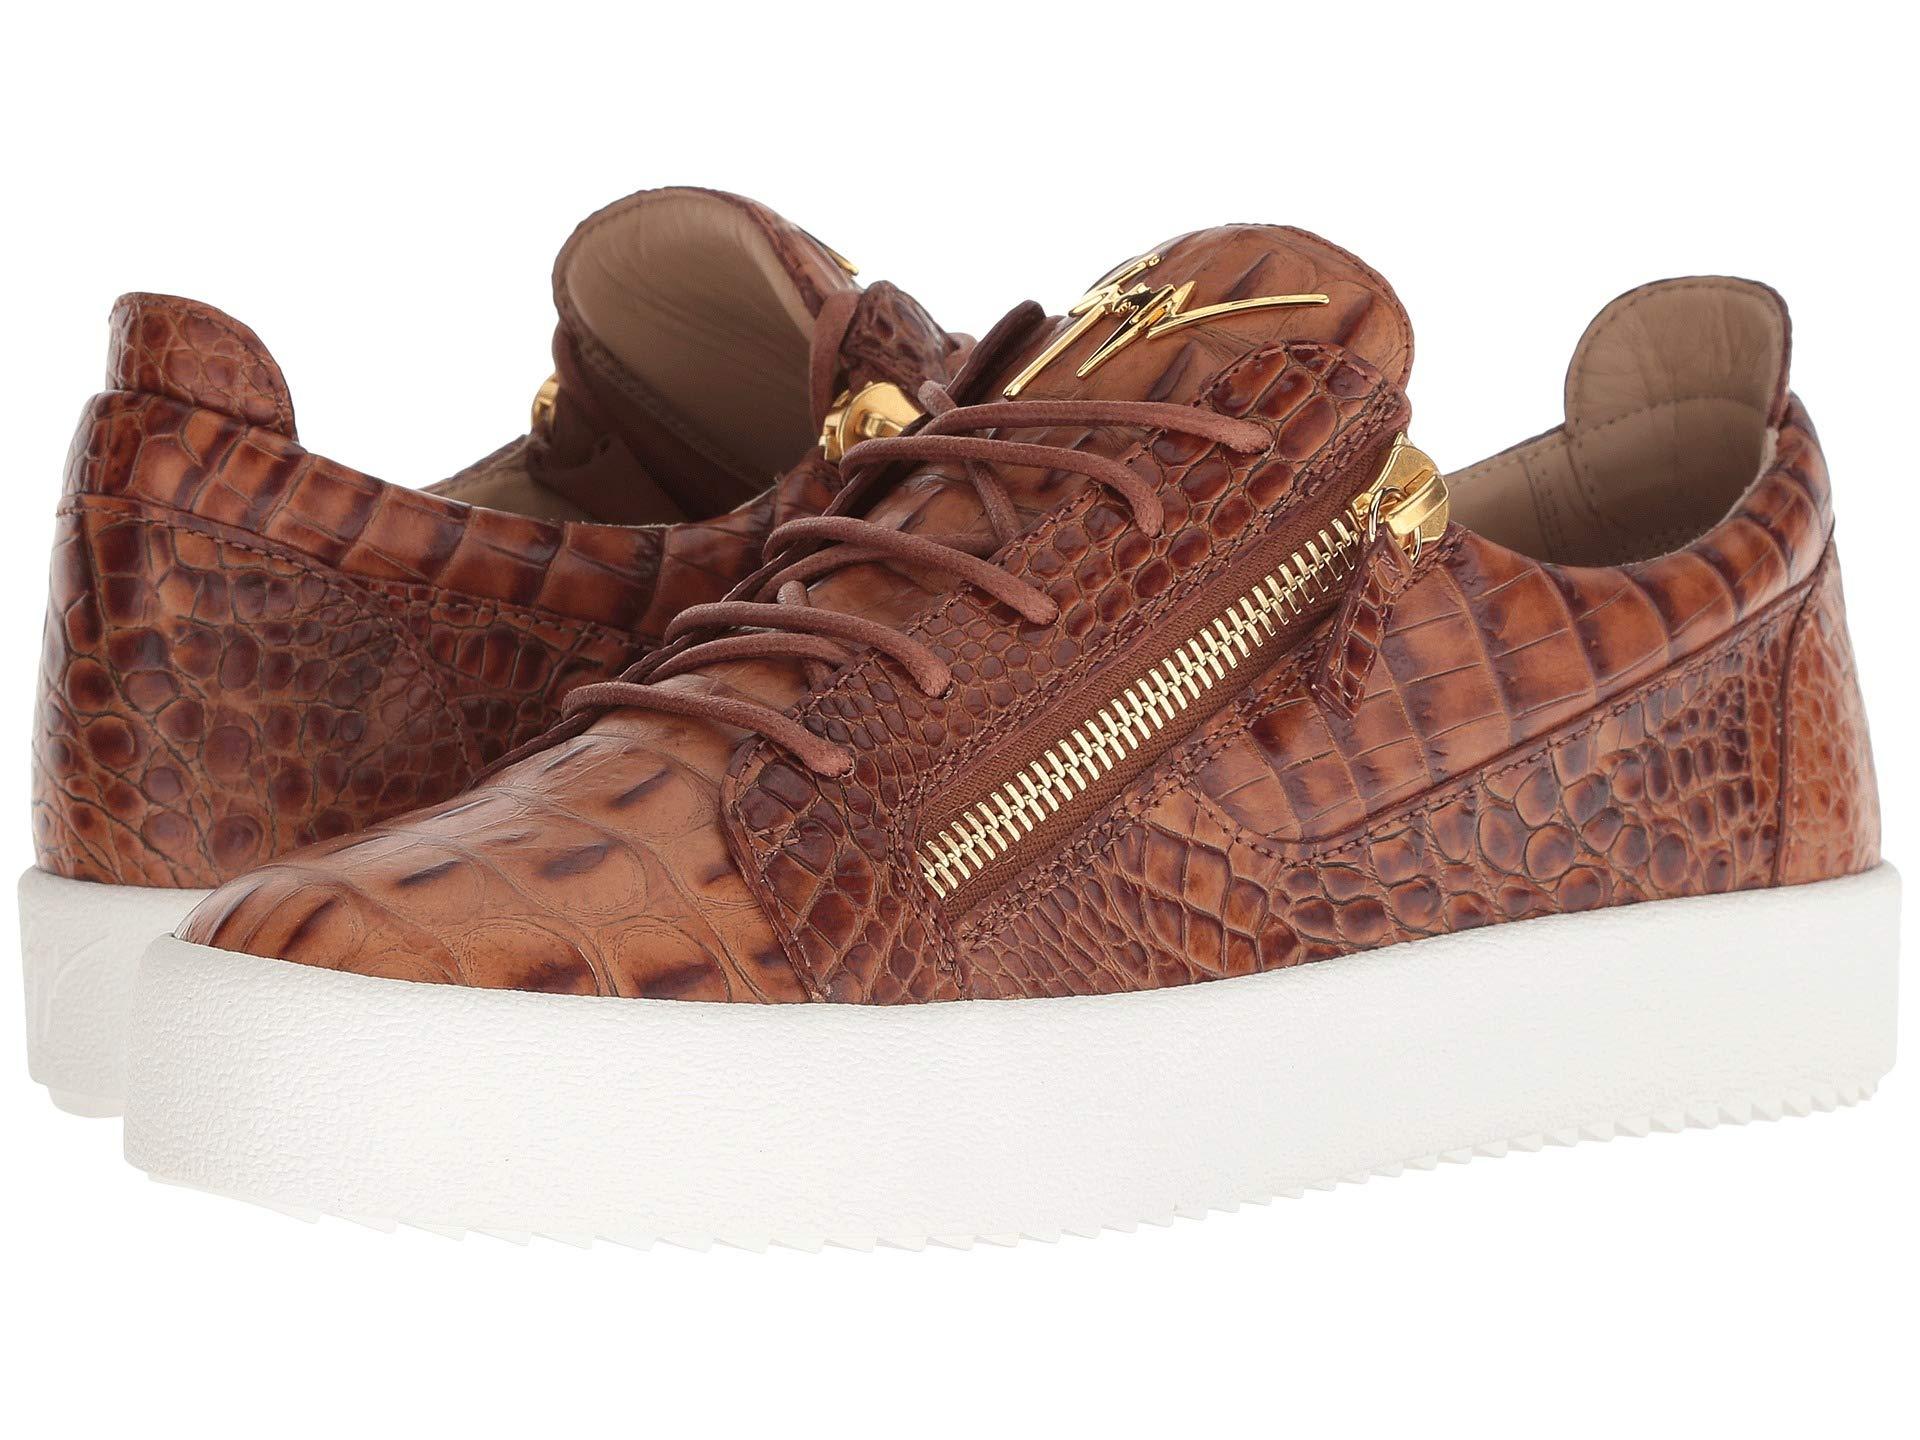 ec282506d24f6 Giuseppe Zanotti Frankie Pyton Low Top Sneaker at Luxury.Zappos.com